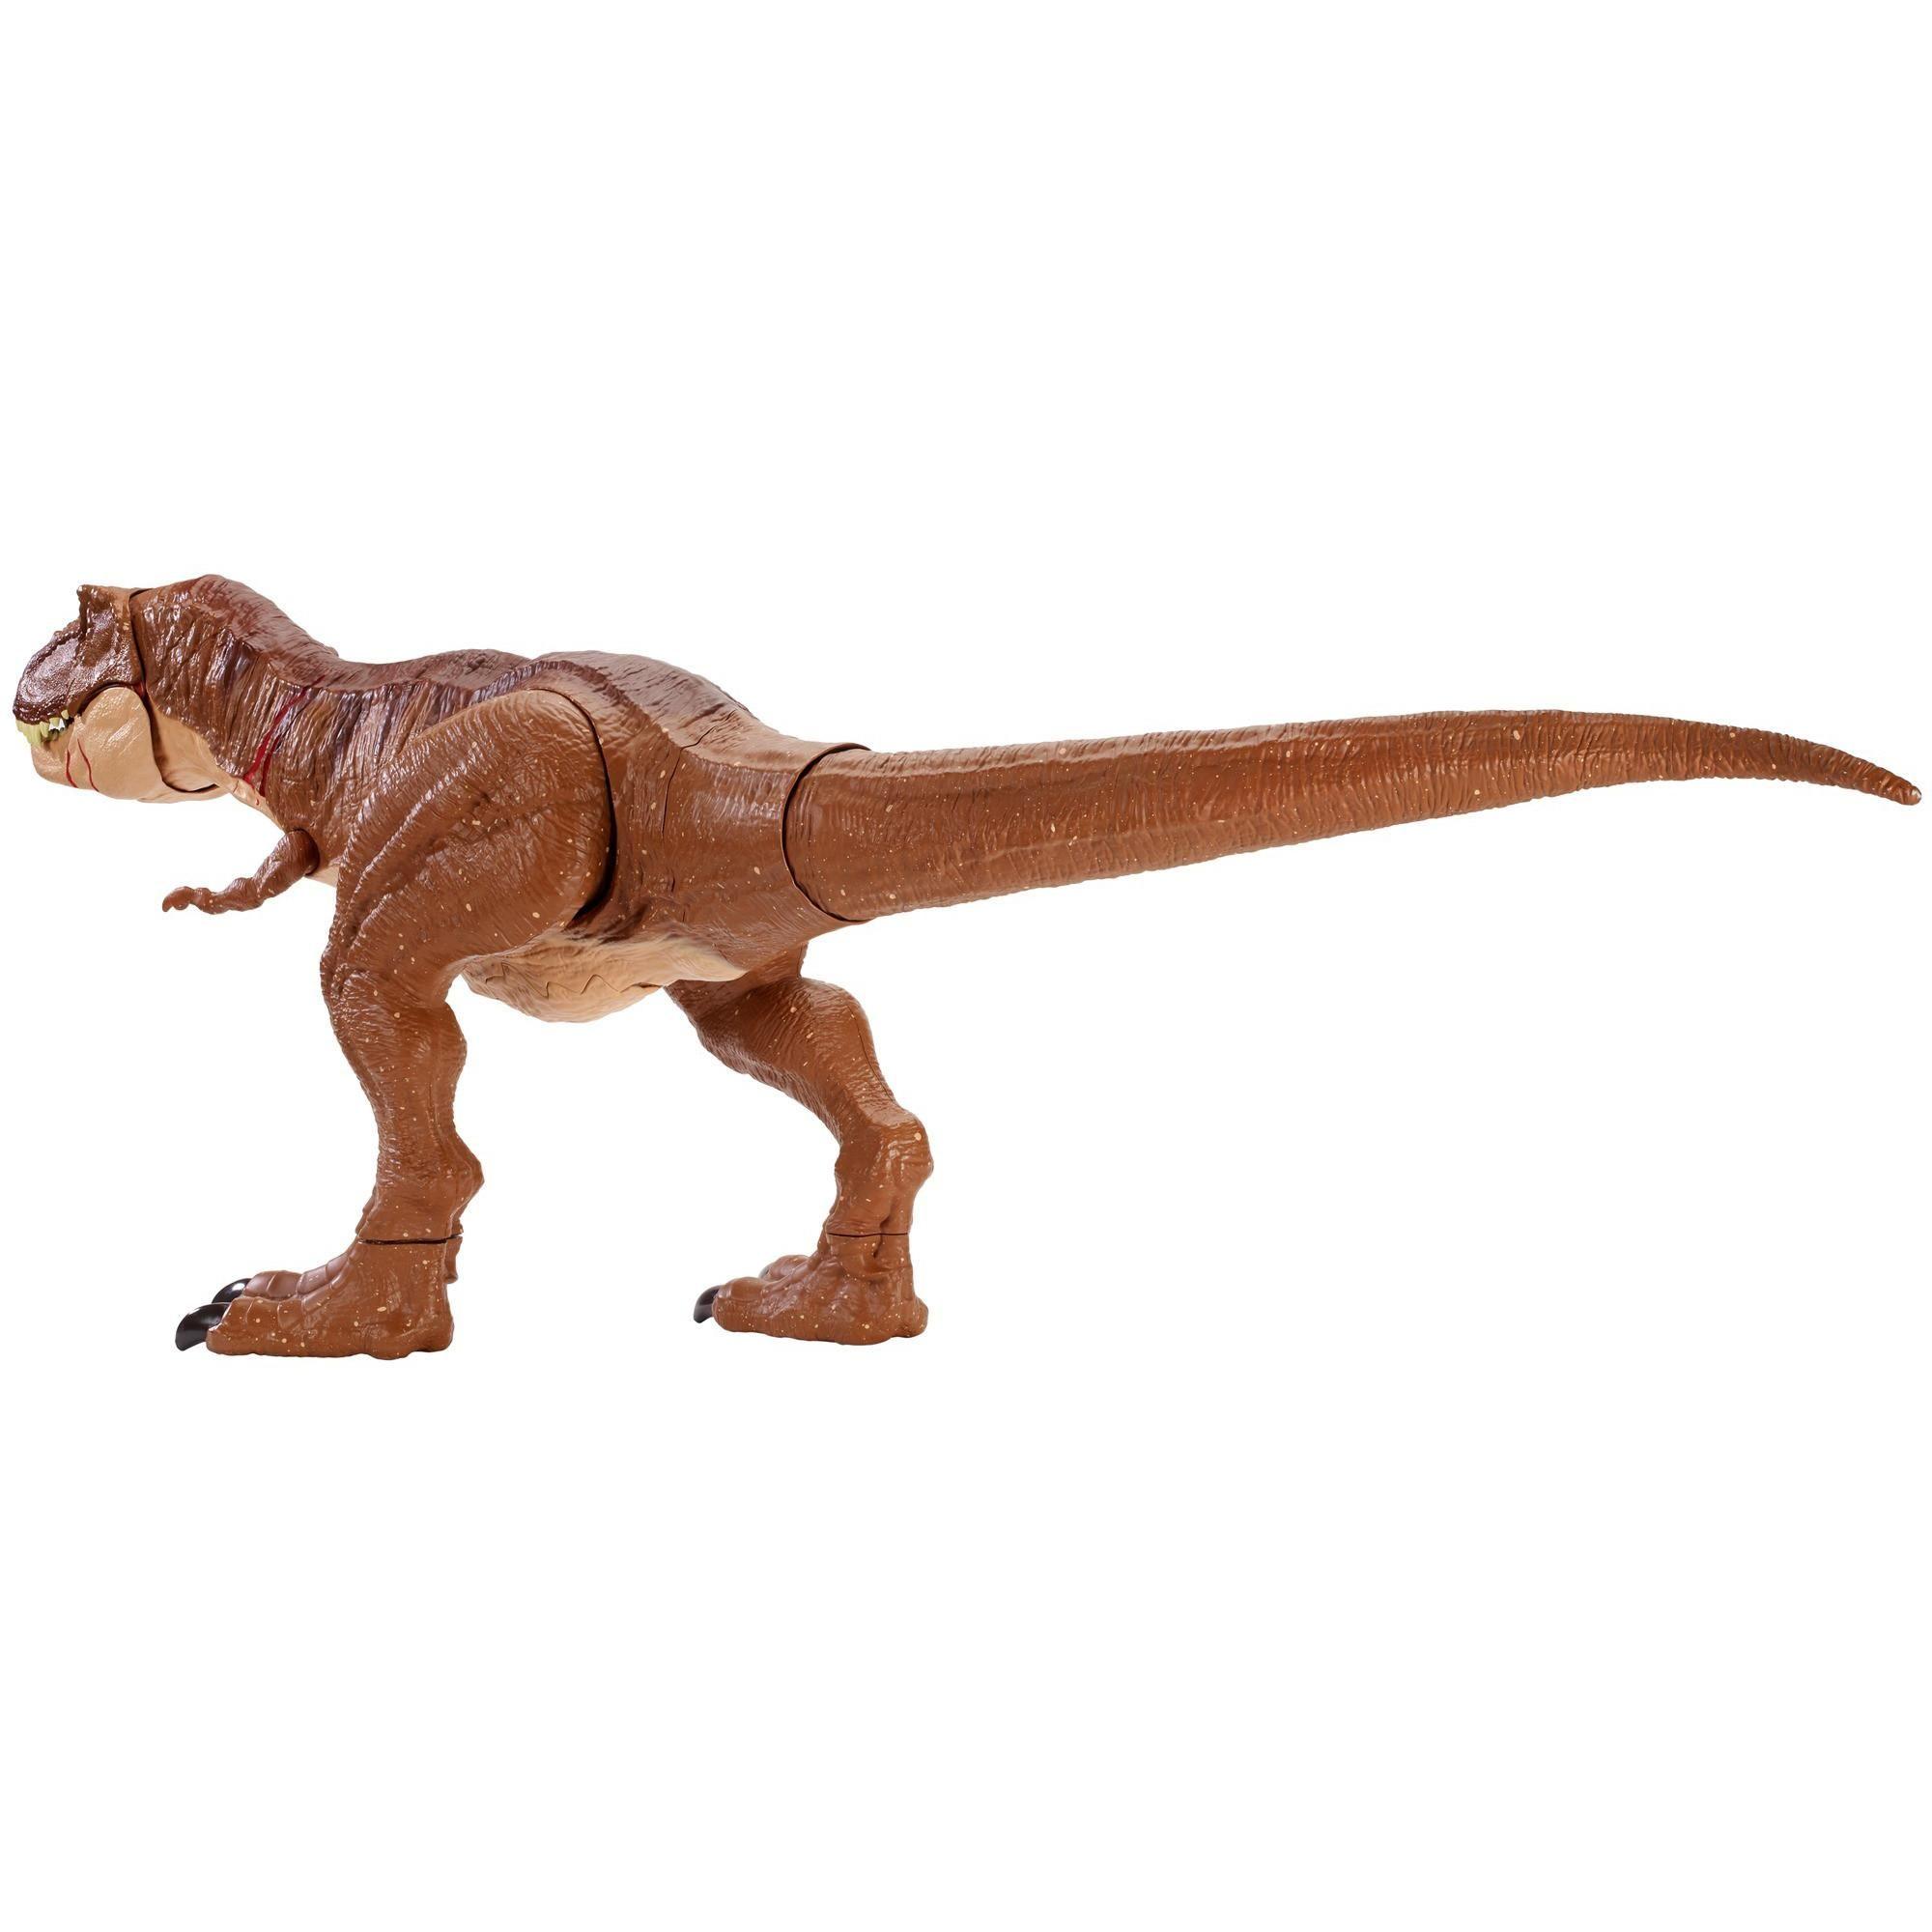 Jurassic World Battle Damage Roarin/' Super Colossal Tyrannosaurus Rex Dinosaur